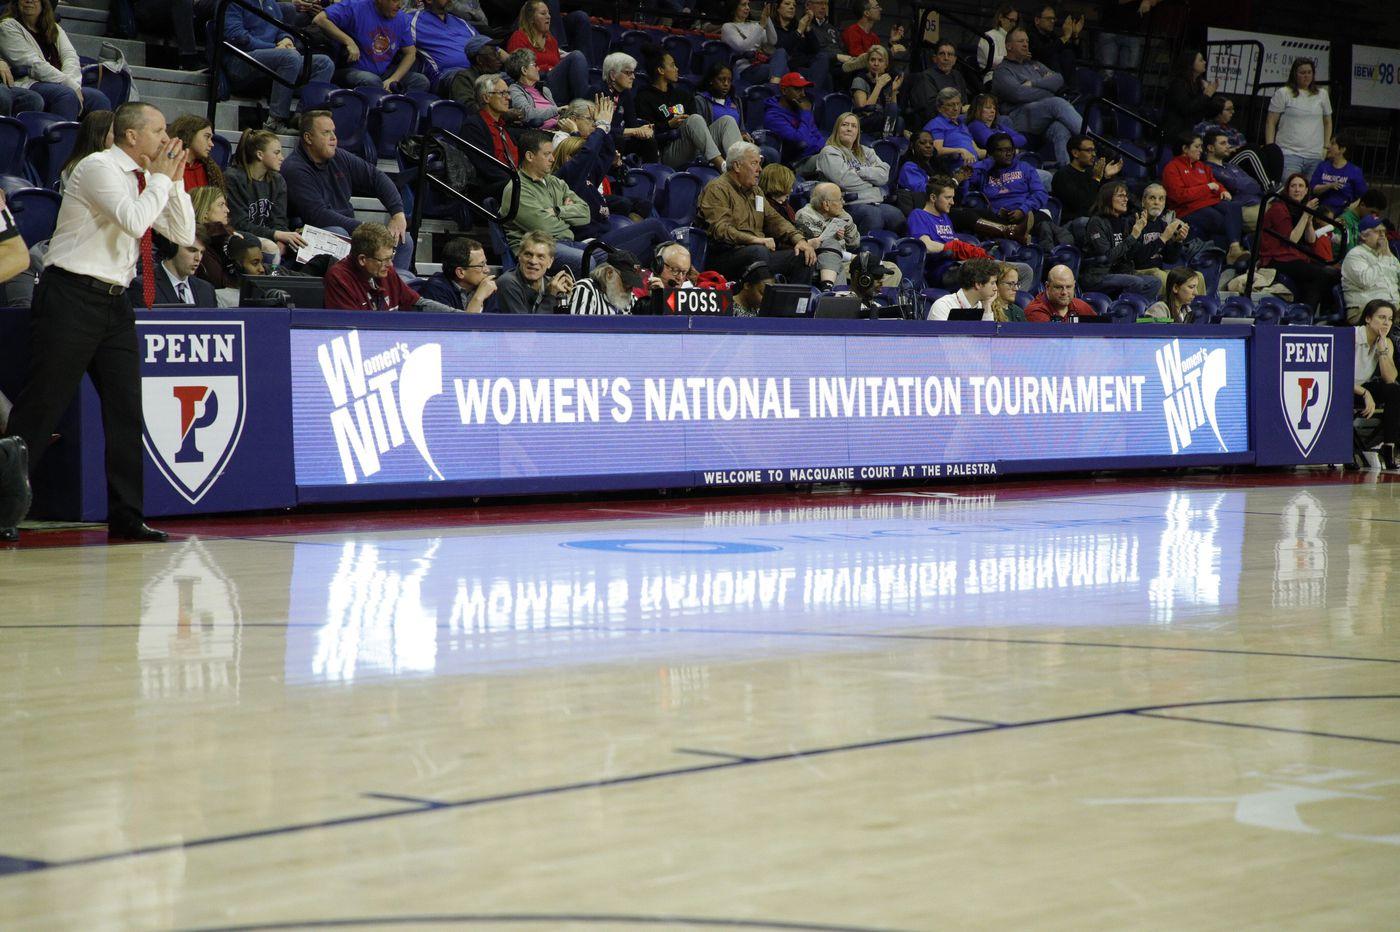 Women's NIT roundup: Villanova beats Old Dominion in overtime, Penn beats American, Drexel loses to Harvard